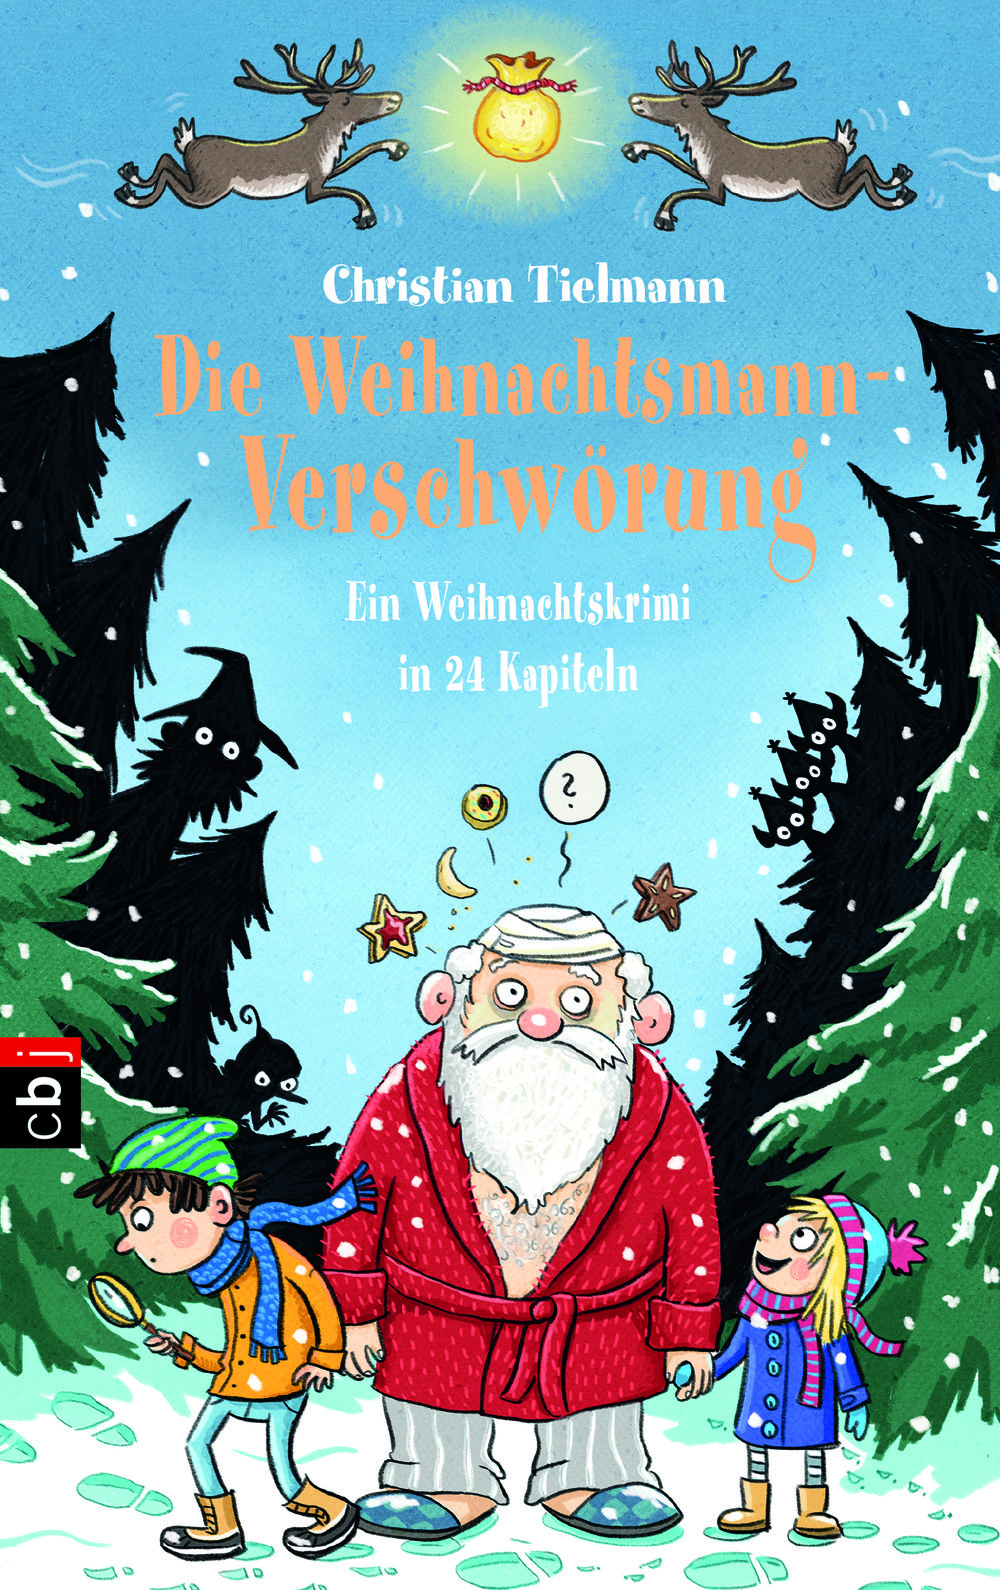 VeraSchmidtWeihnachtskrimicover.jpg